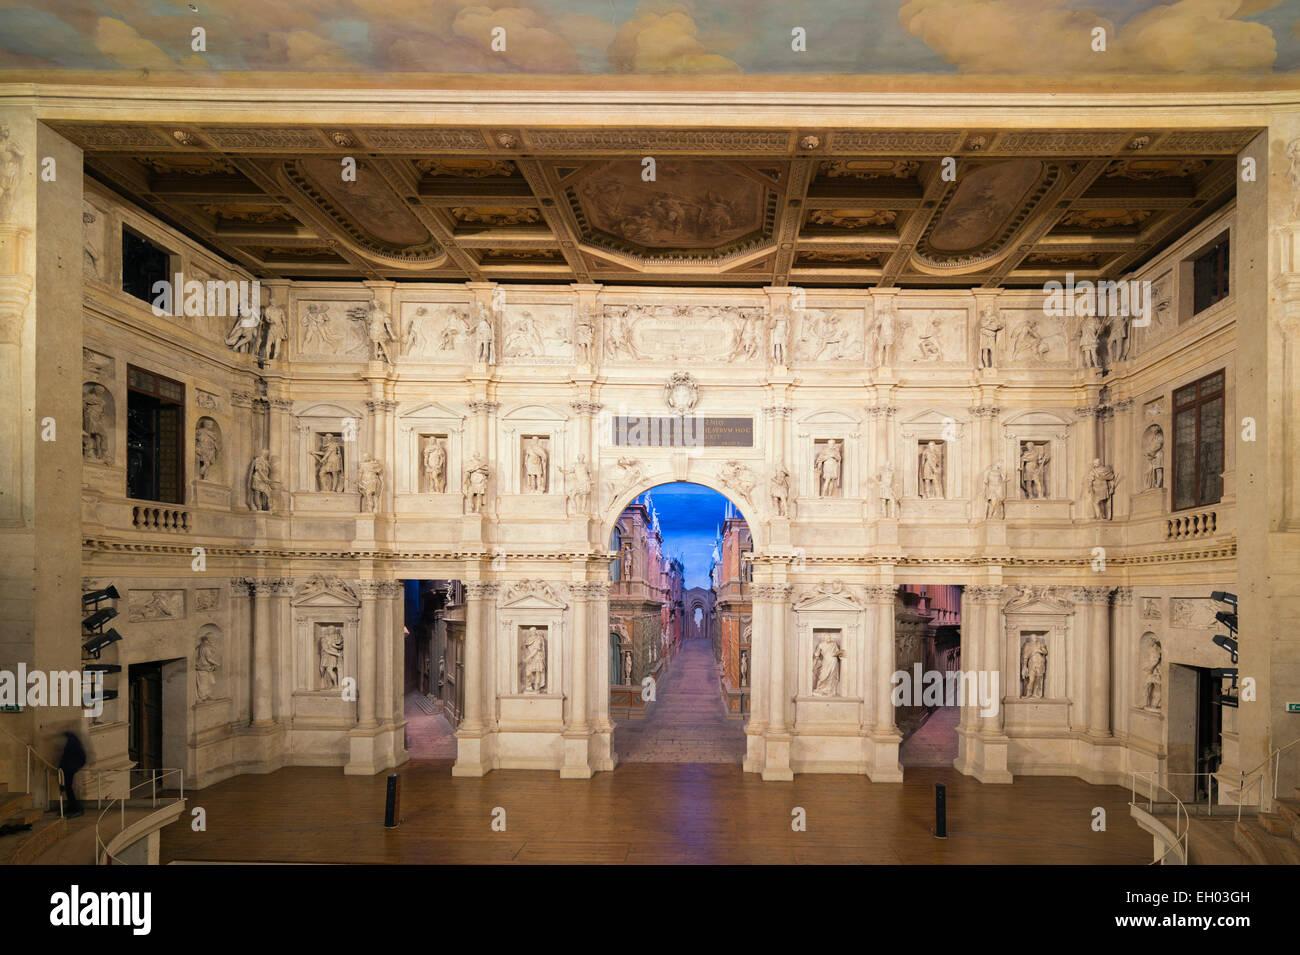 Europe, Italy, Veneto, Vicenza, Teatro Olimpico, theatre designed Andrea Palladio, Unesco World Heritage Site - Stock Image